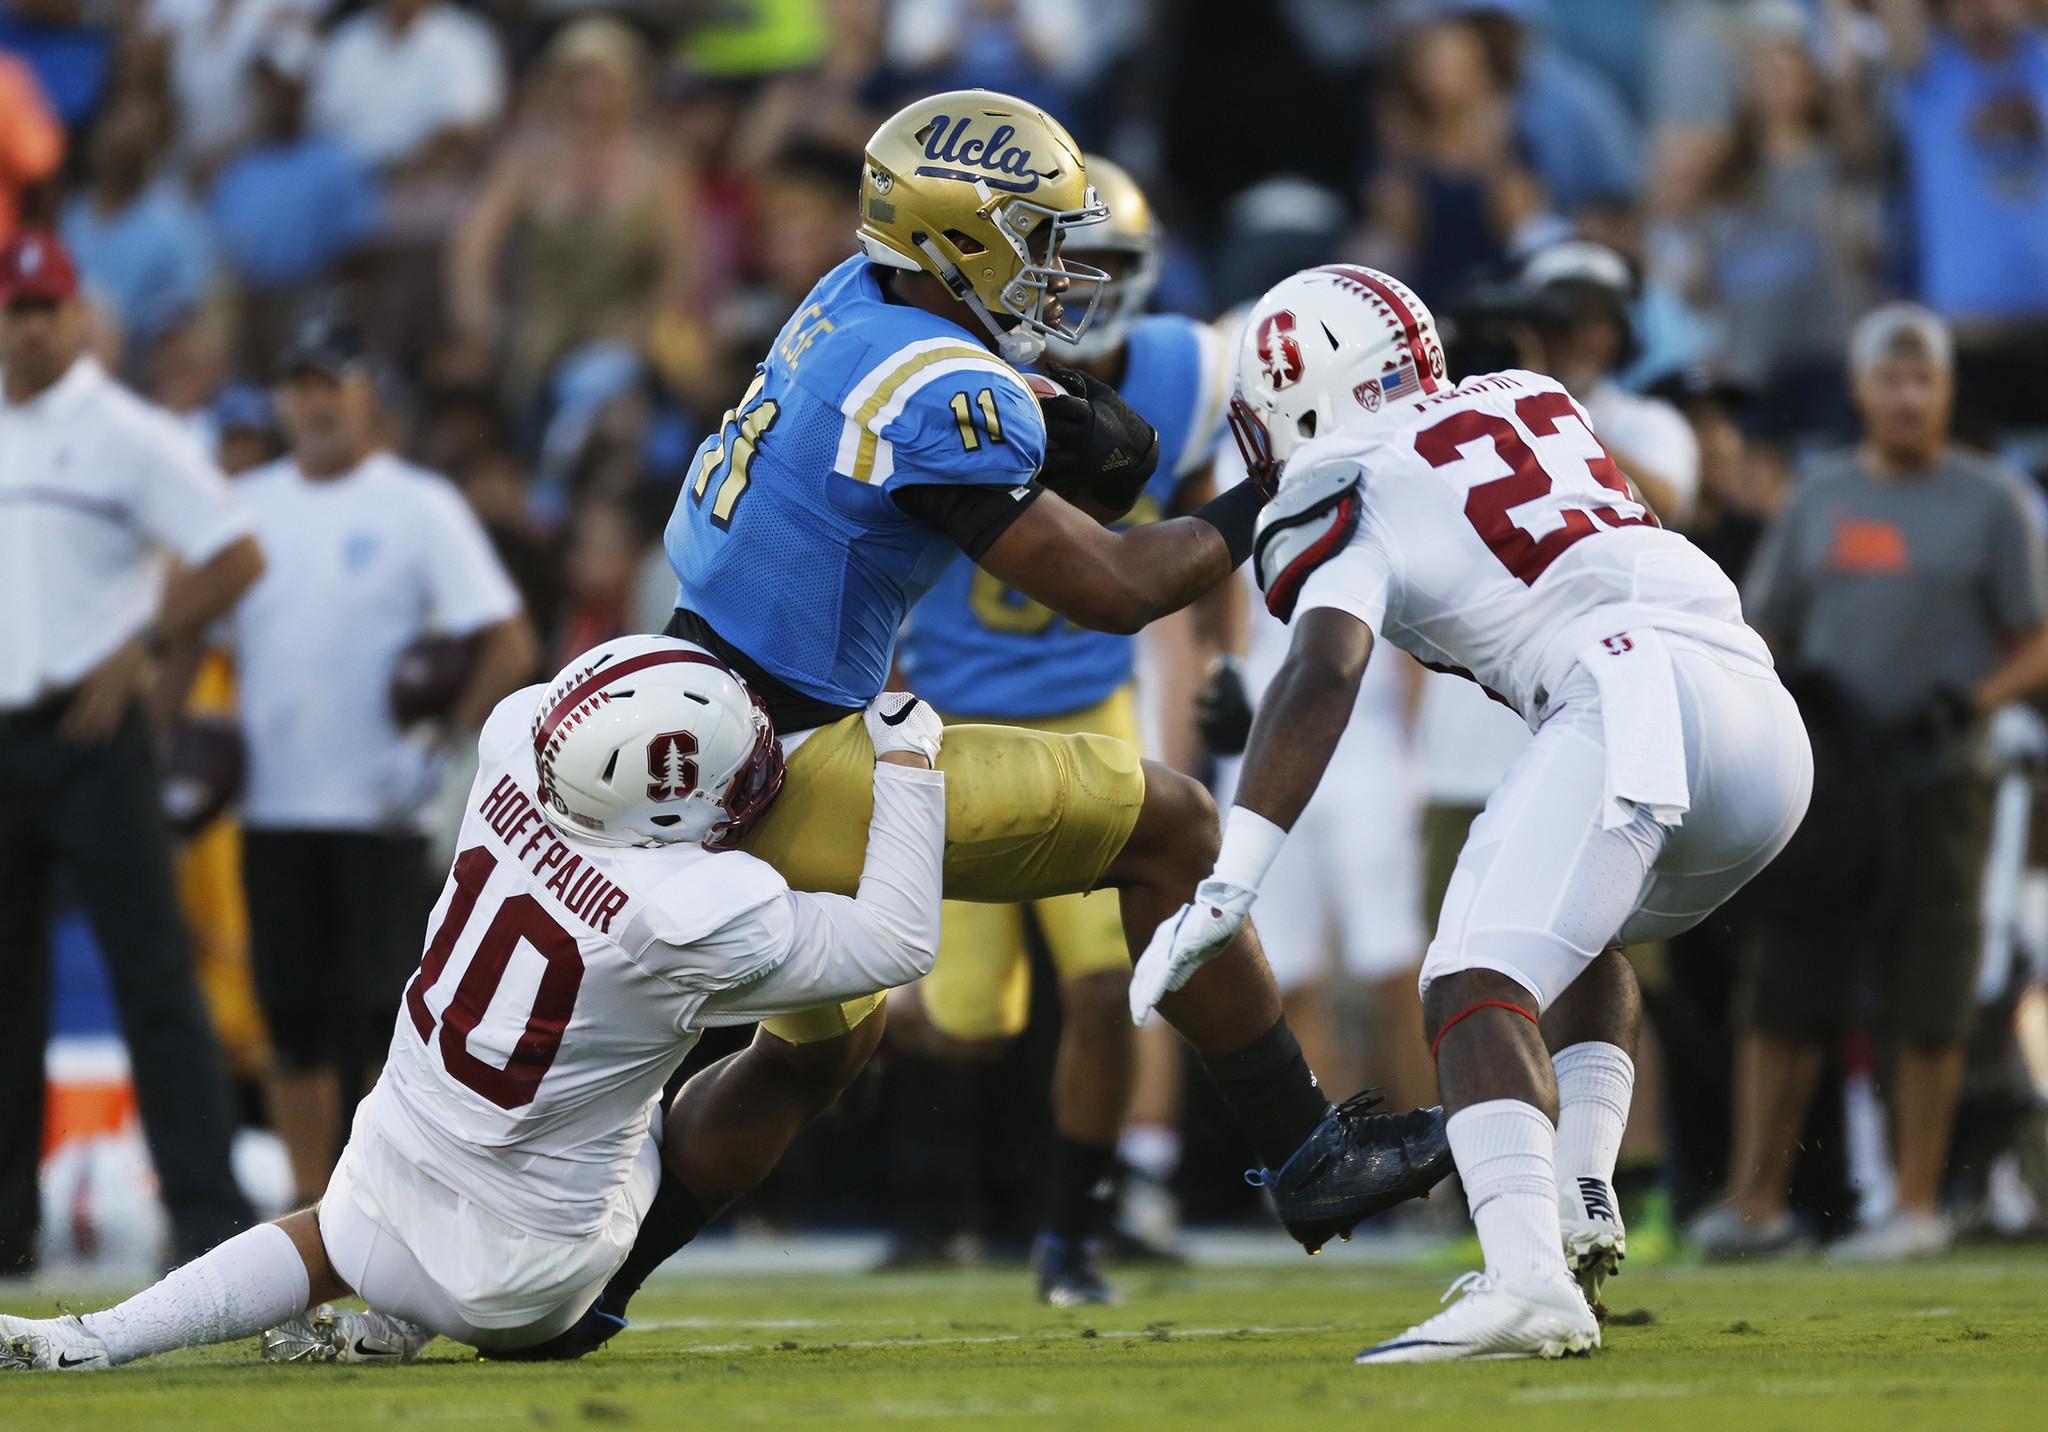 La-sp-college-football-targeting-20160927-snap